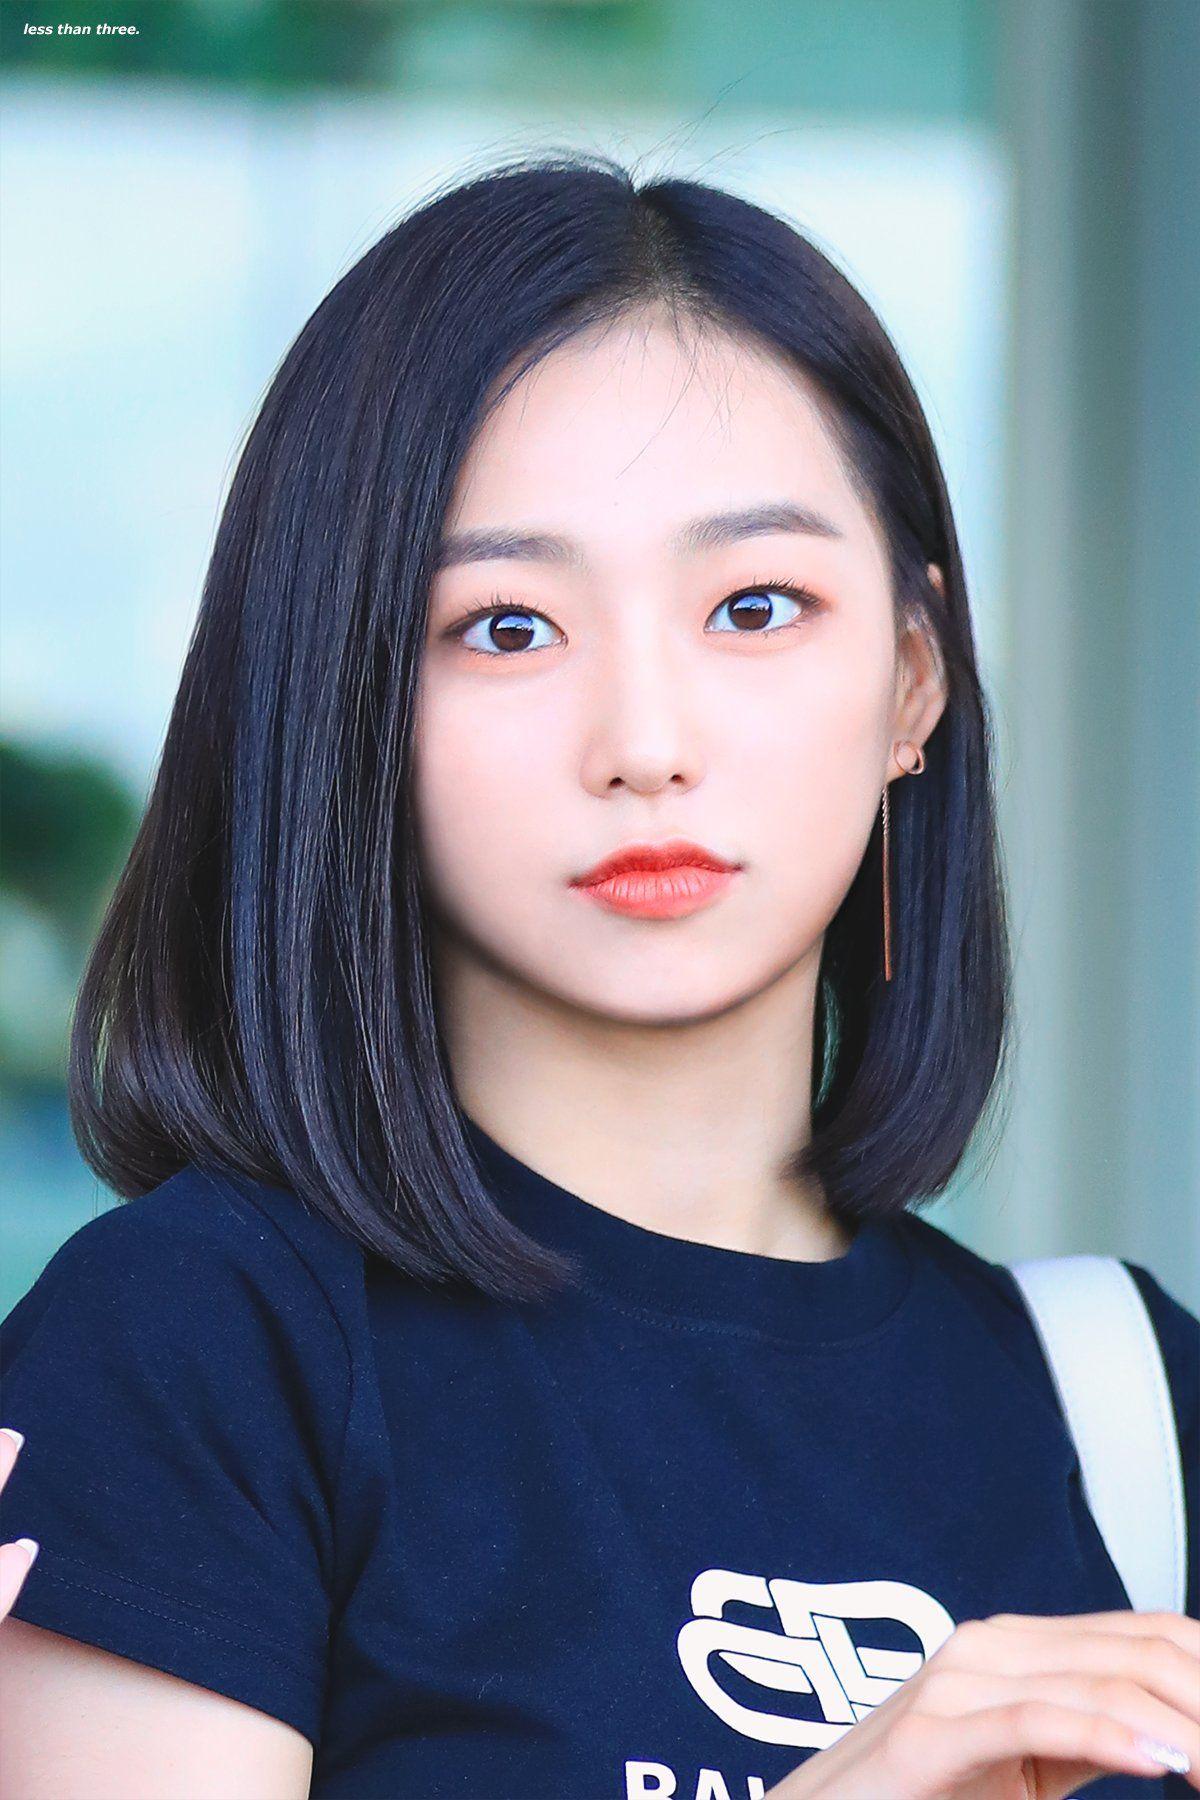 Pin By Makayla Hsu On K Pop Idol Kpop Short Hair Short Hair Pictures Girl Short Hair